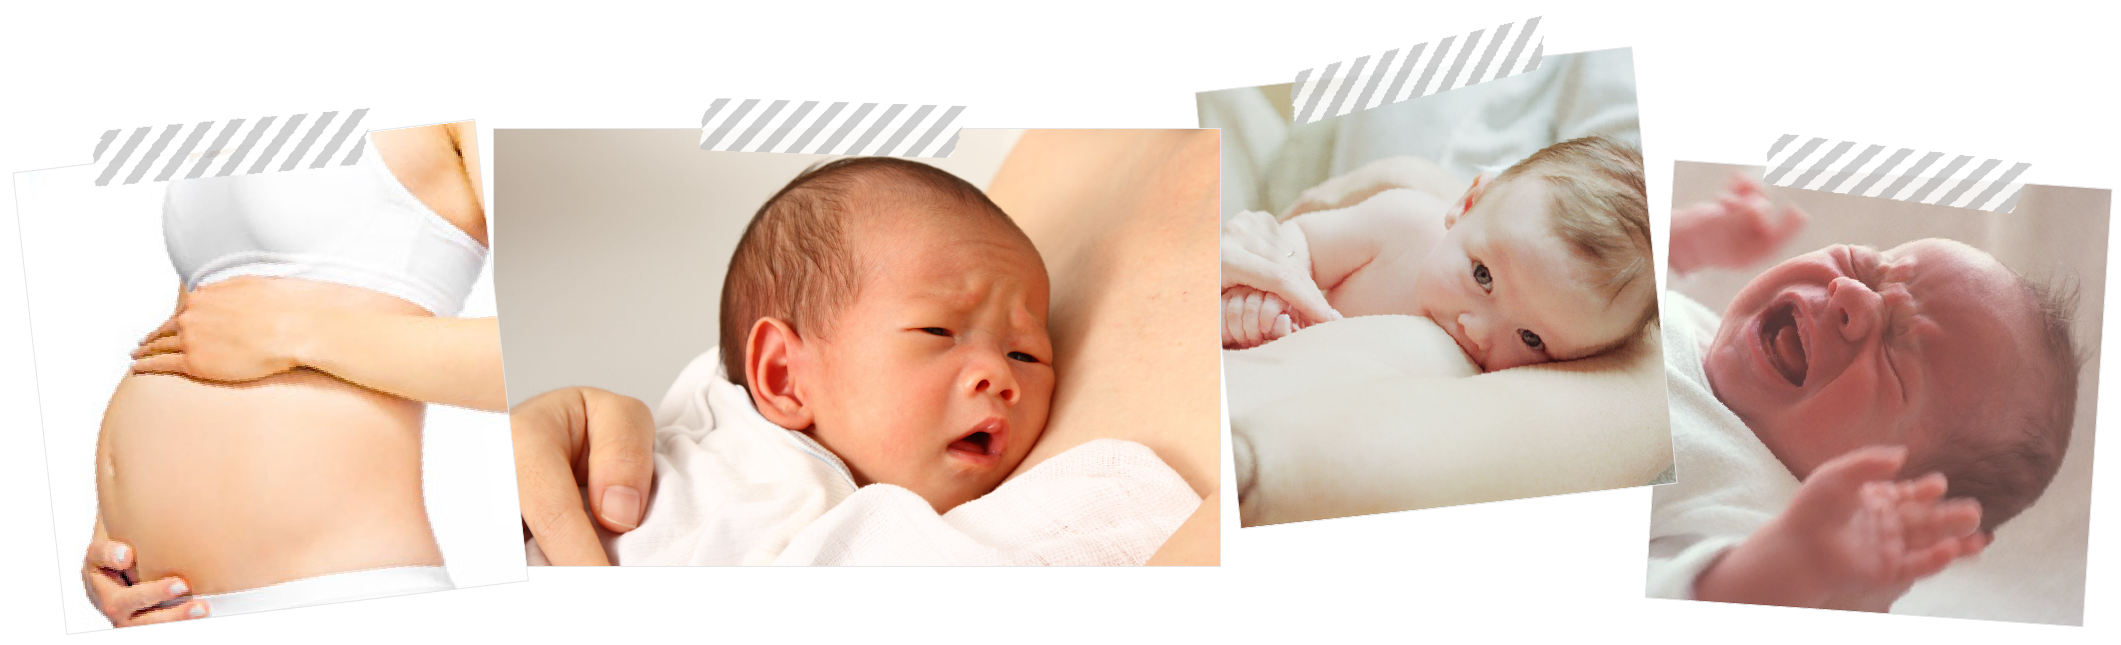 babies-2x